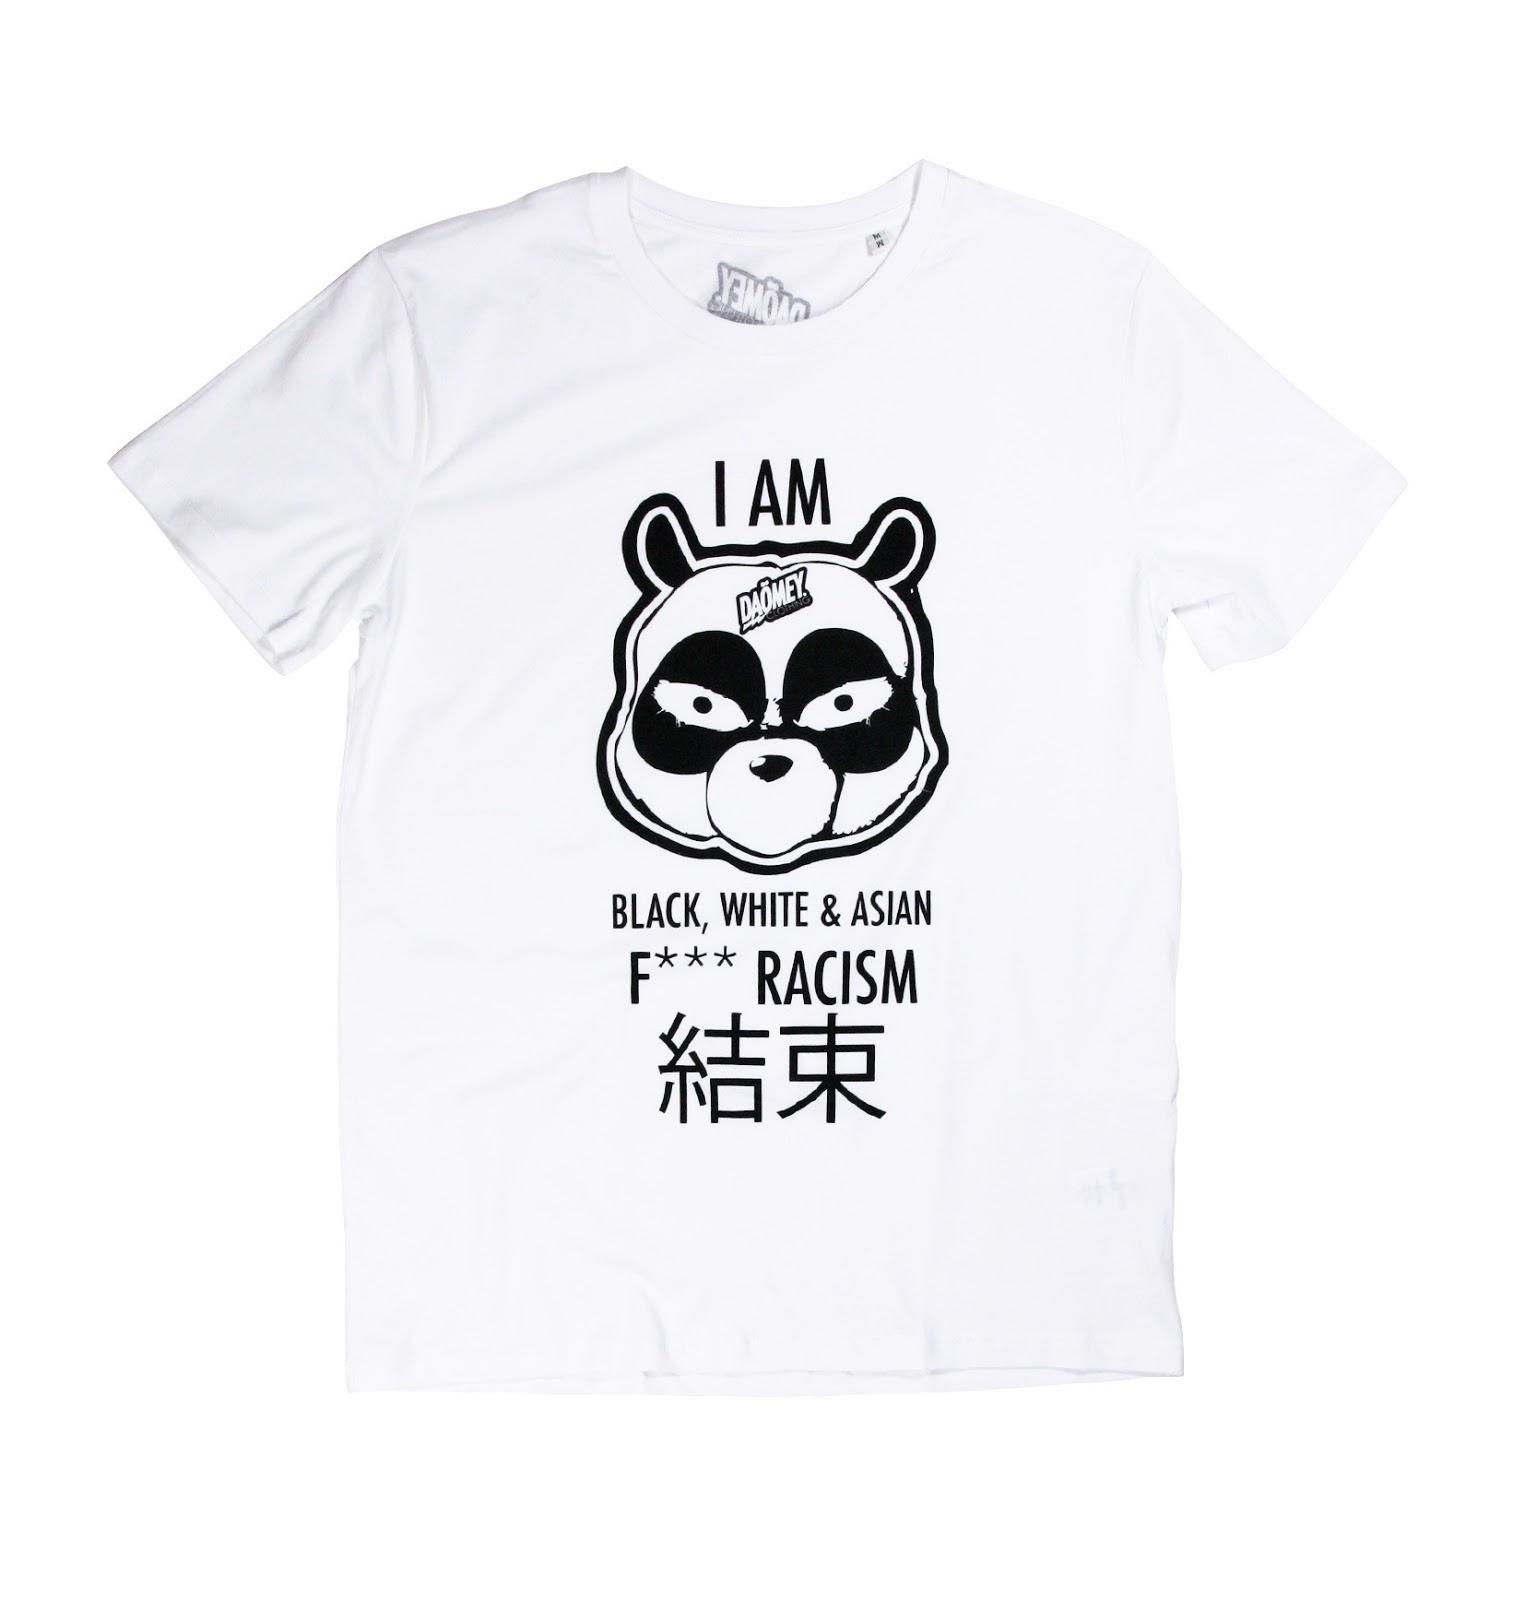 https://grafitee.es/s/camisetas/355-tee-shirt-unity.html